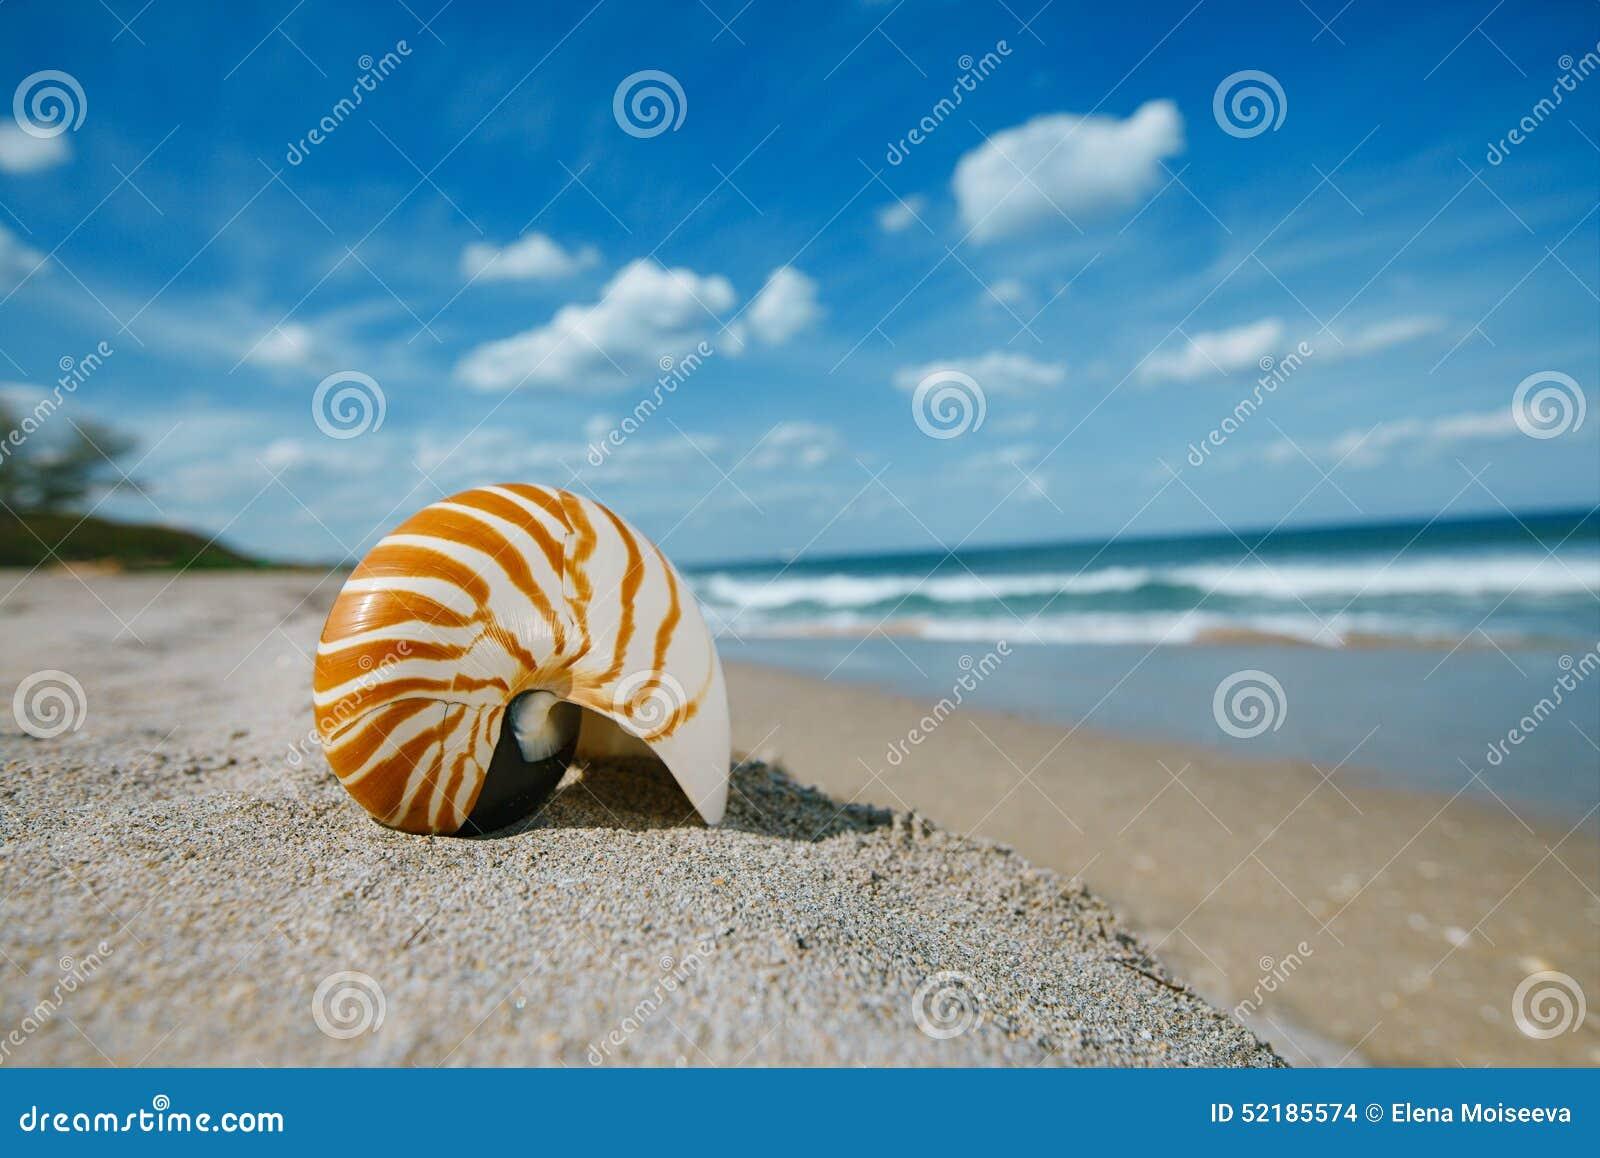 beach sun and white soft sand Buy beach sand products like roakohu beach shade in sand sun, sand & a tall drink in my hand beach towel in orange and soft white sand.